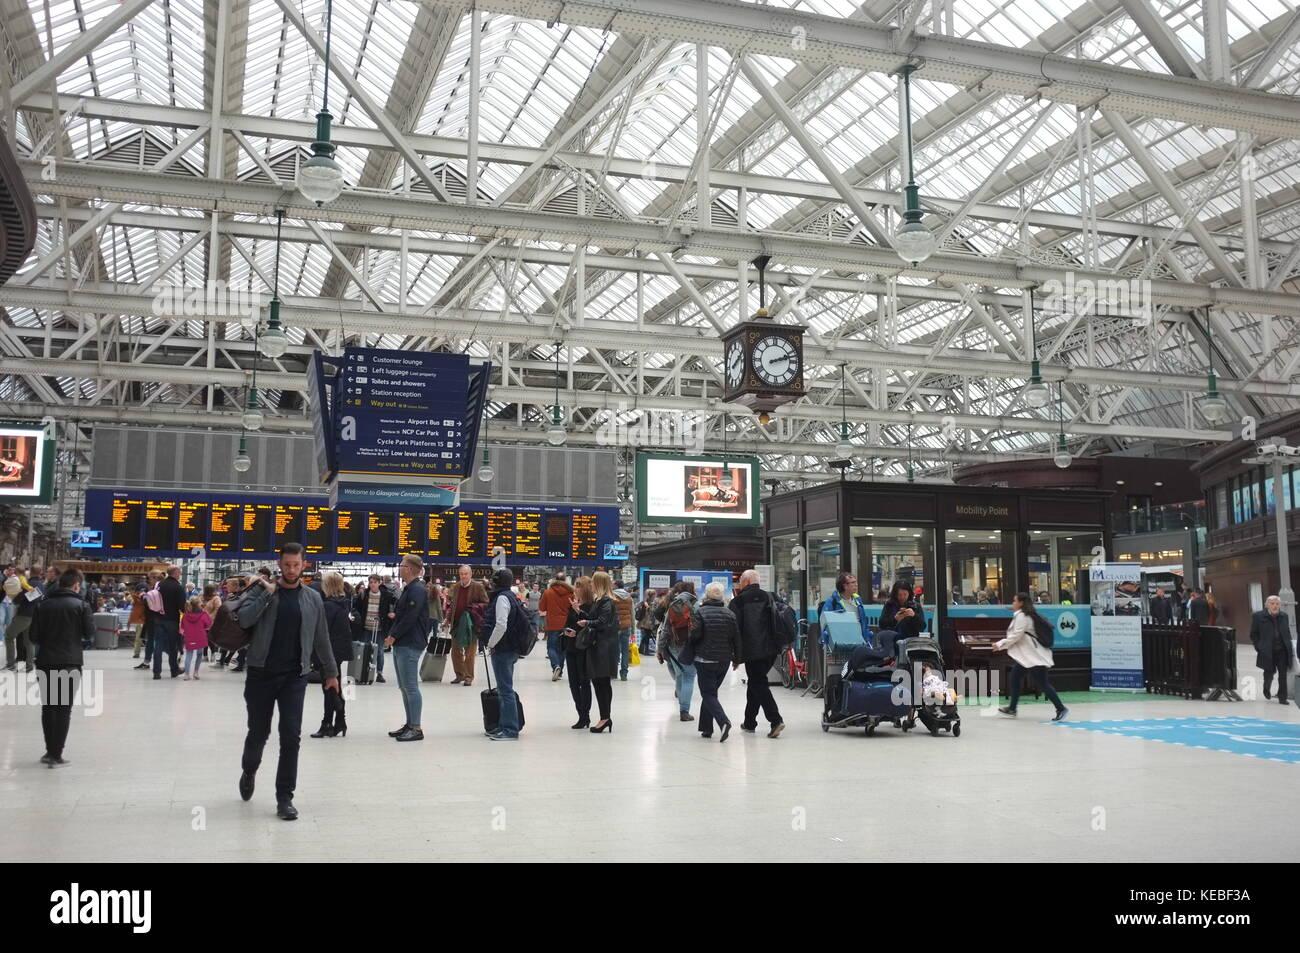 Central railway station, Glasgow, Scotland, United Kingdom. 16 September 2017. - Stock Image